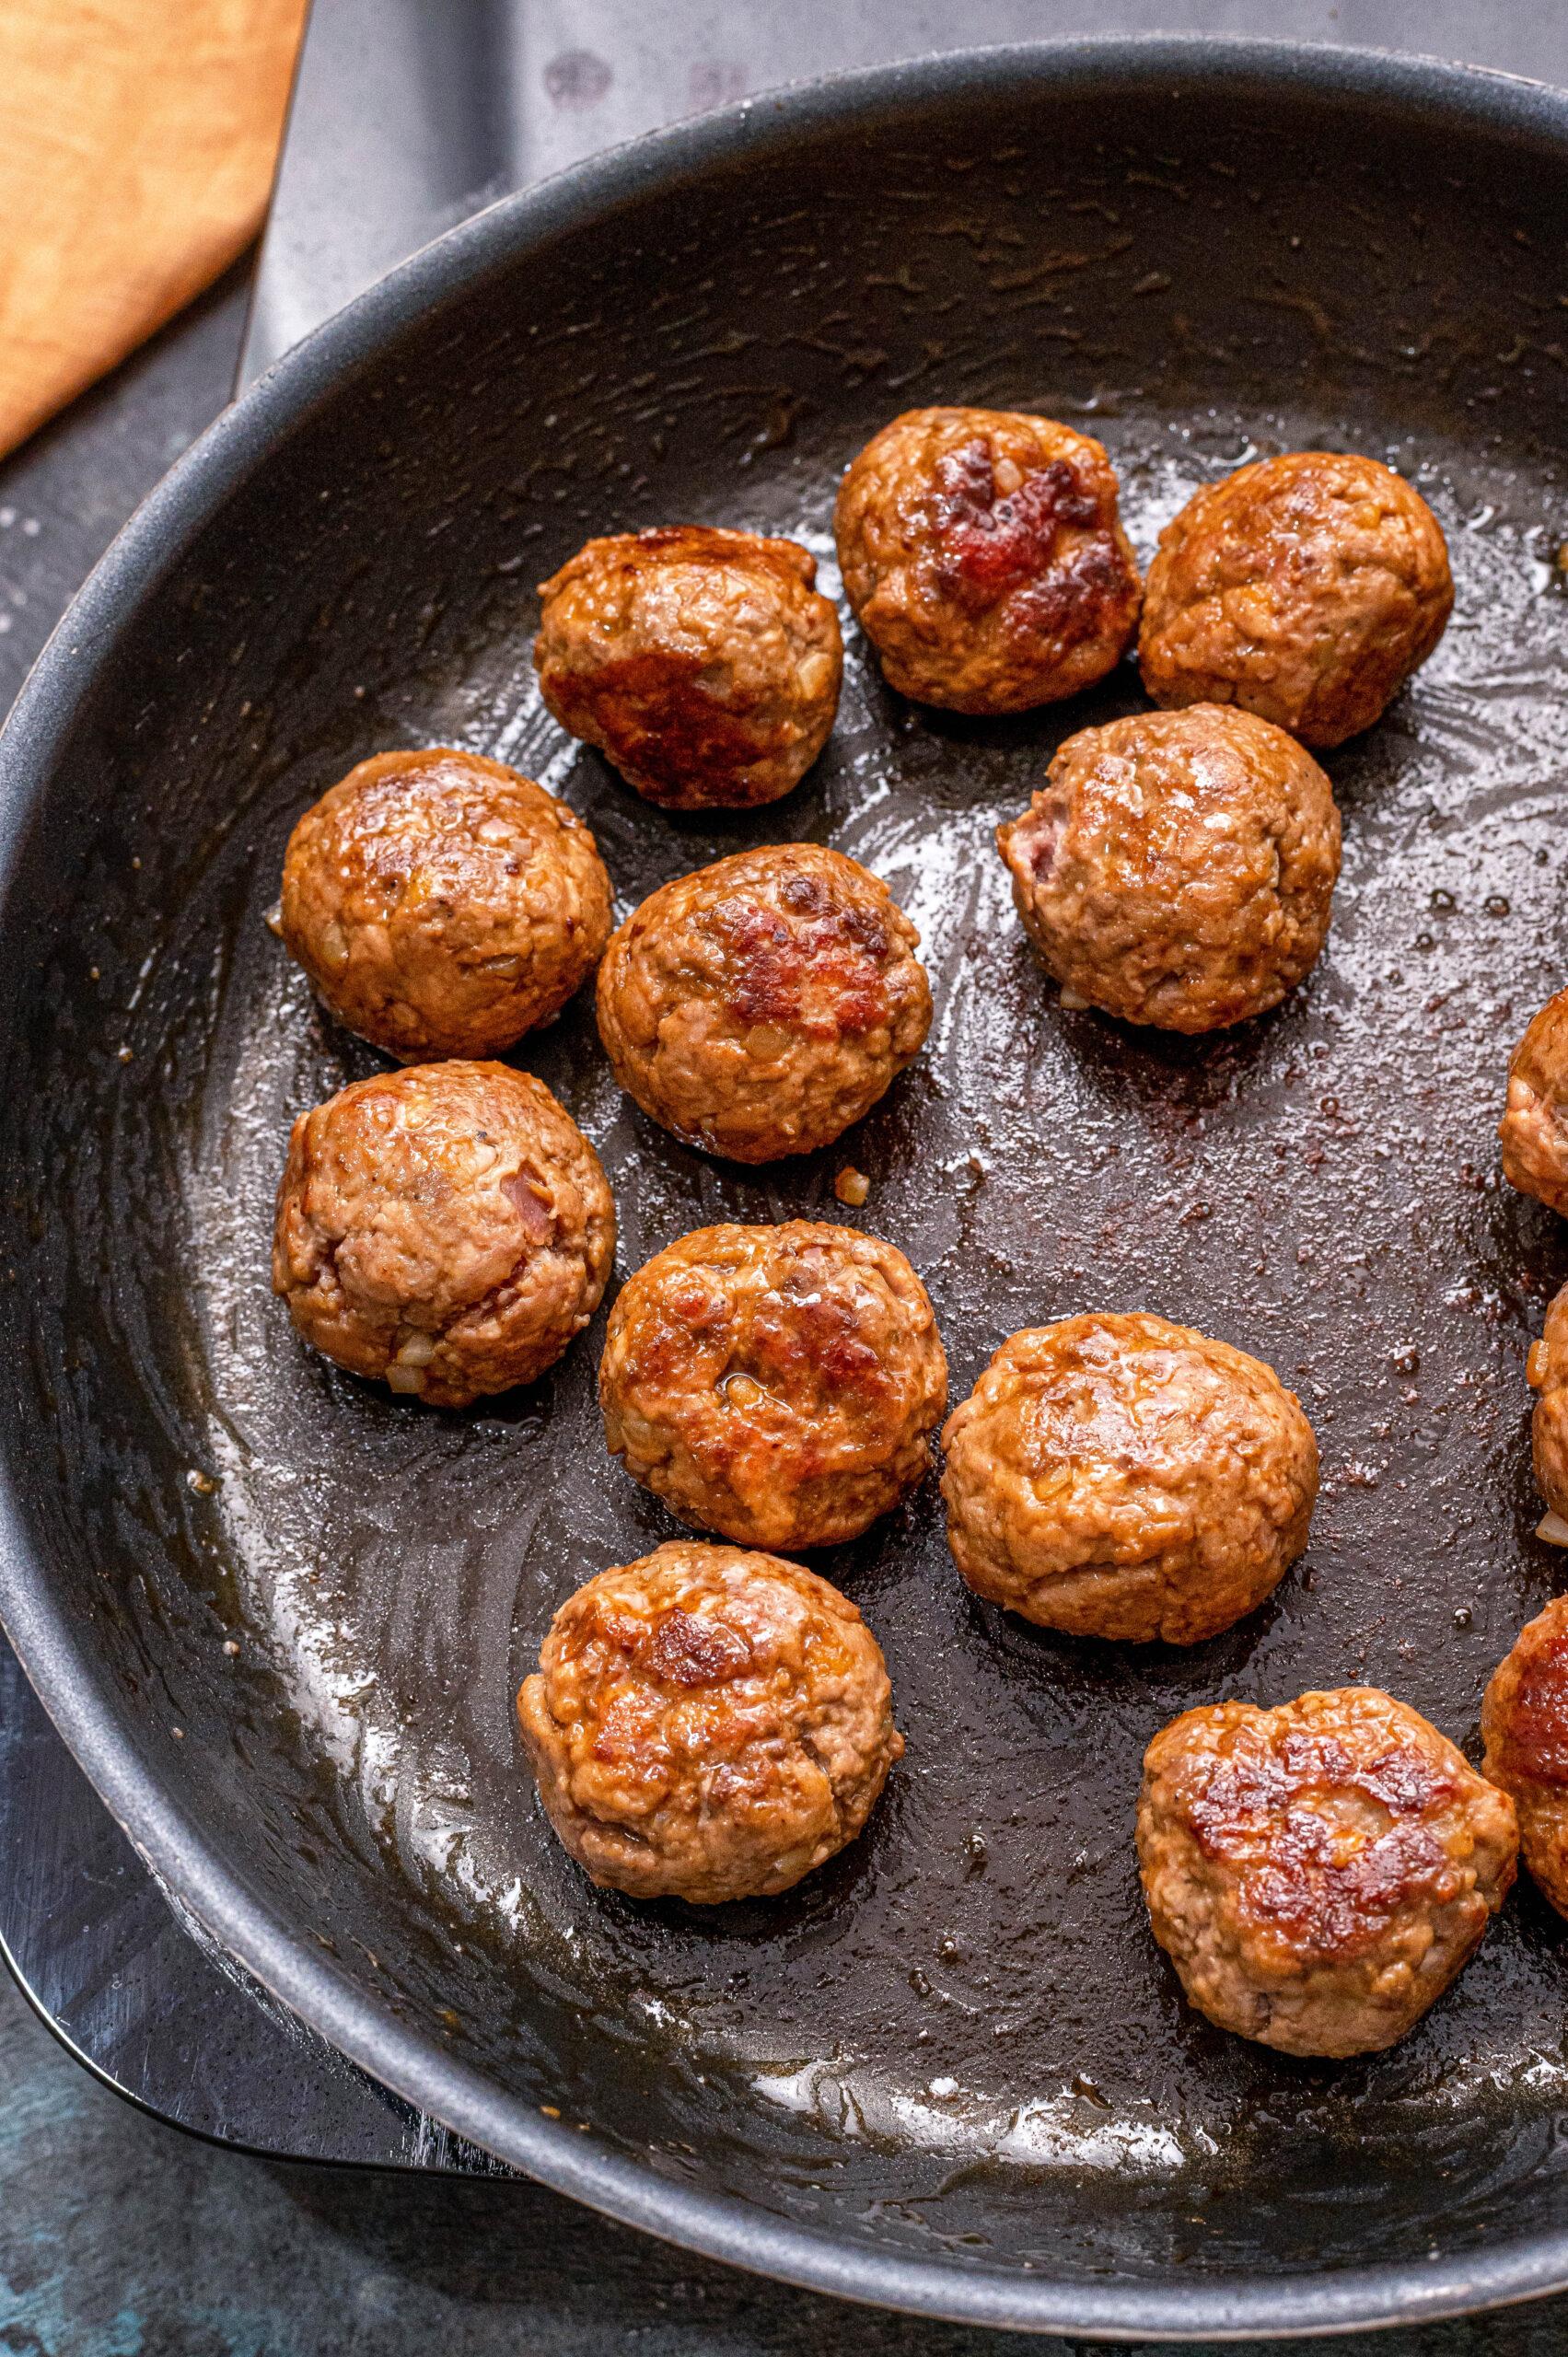 Swedish Meatballs Frying in a Skillet